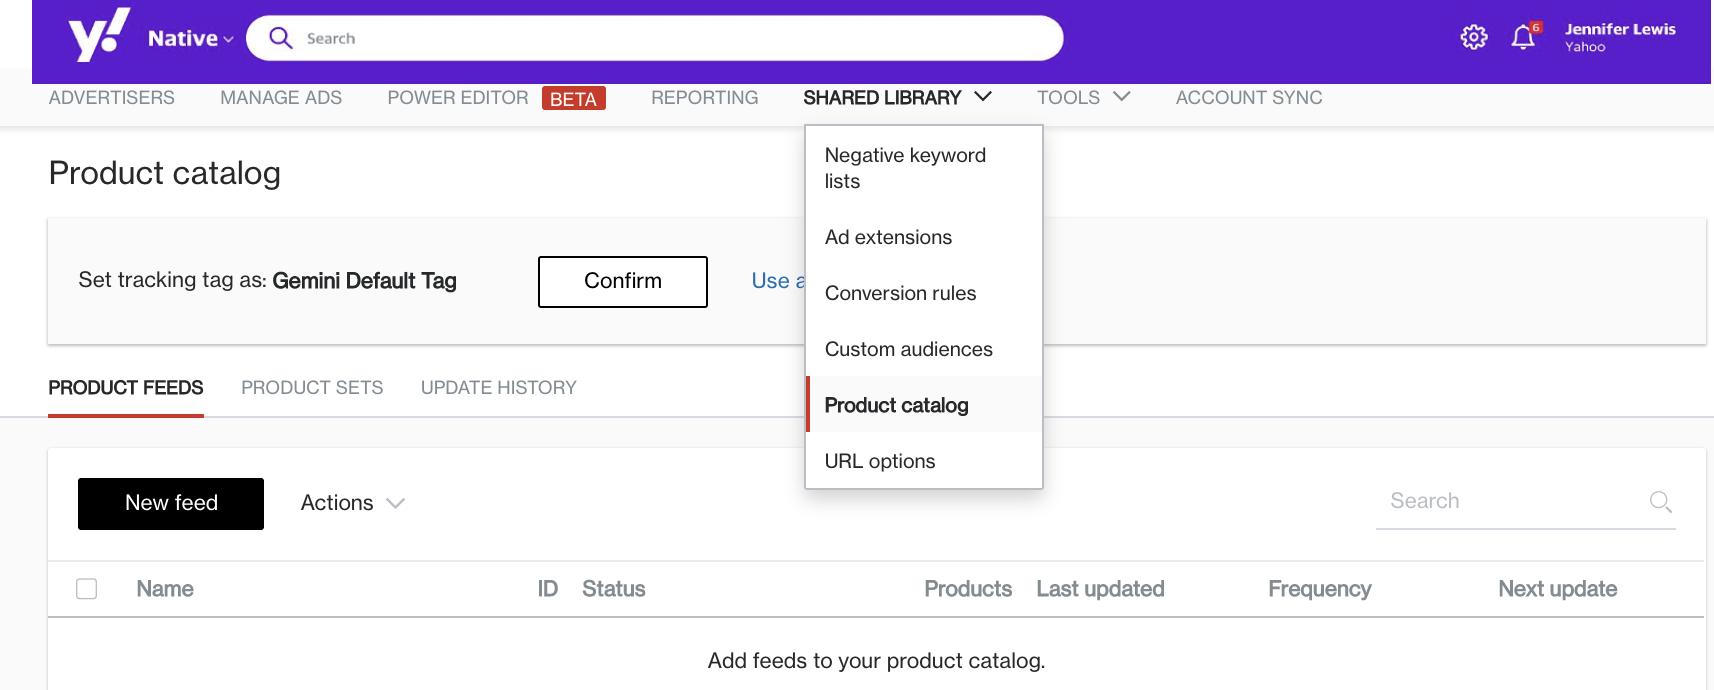 product catalog dropdown